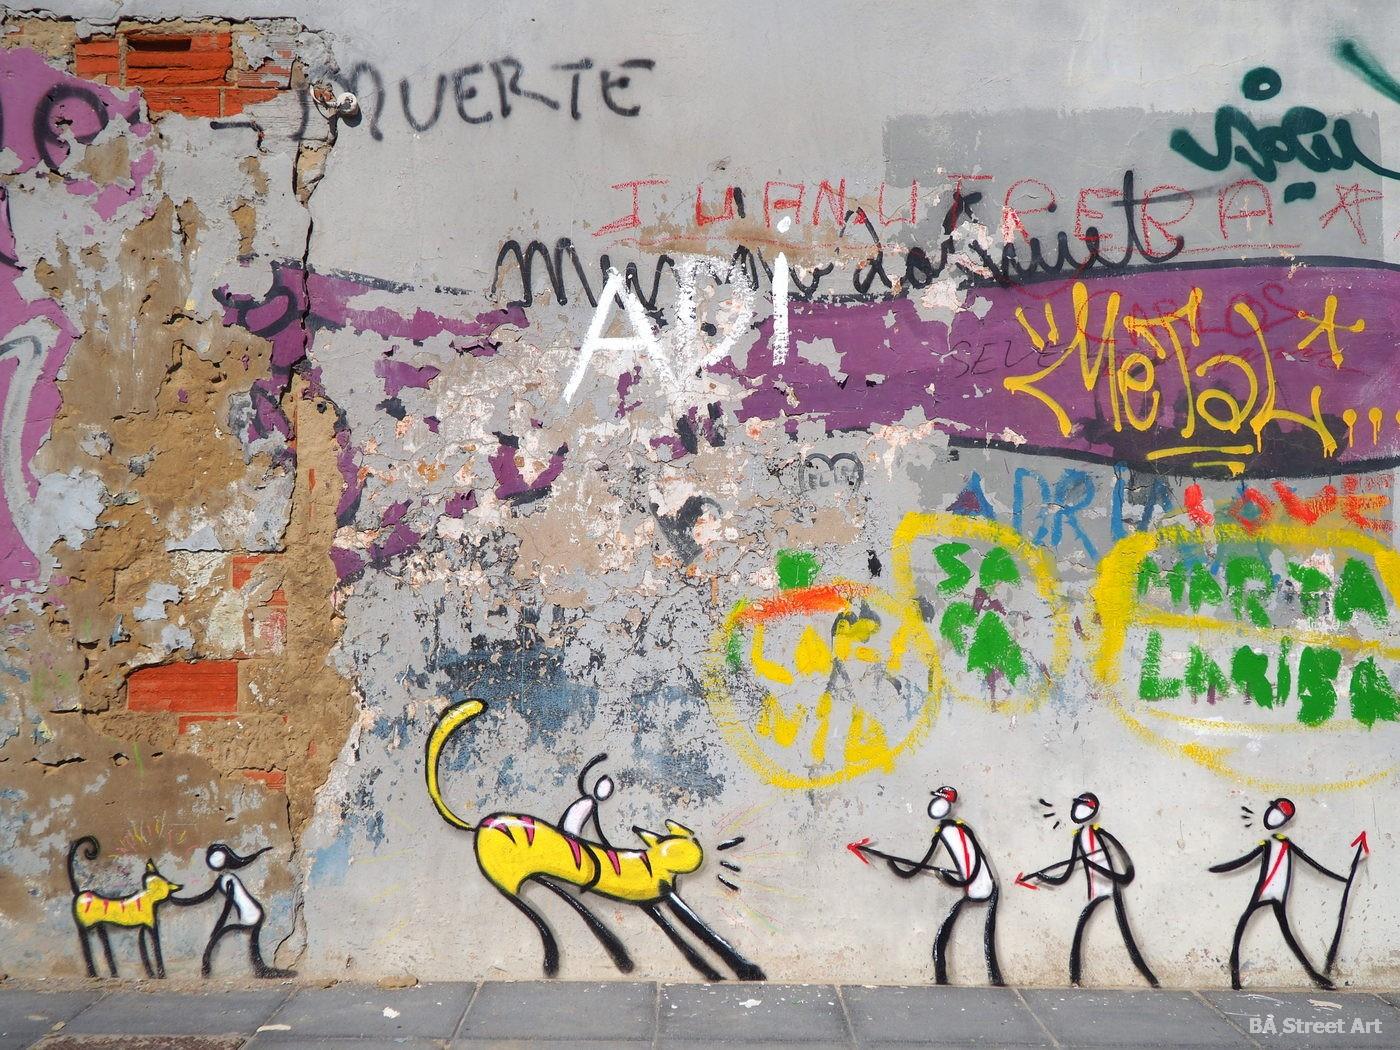 valencia Cabañal-Cañamelar cabanyal murales arte urbano figuras dibujos tour graffiti playa beach españa buenosairesstreetart.com